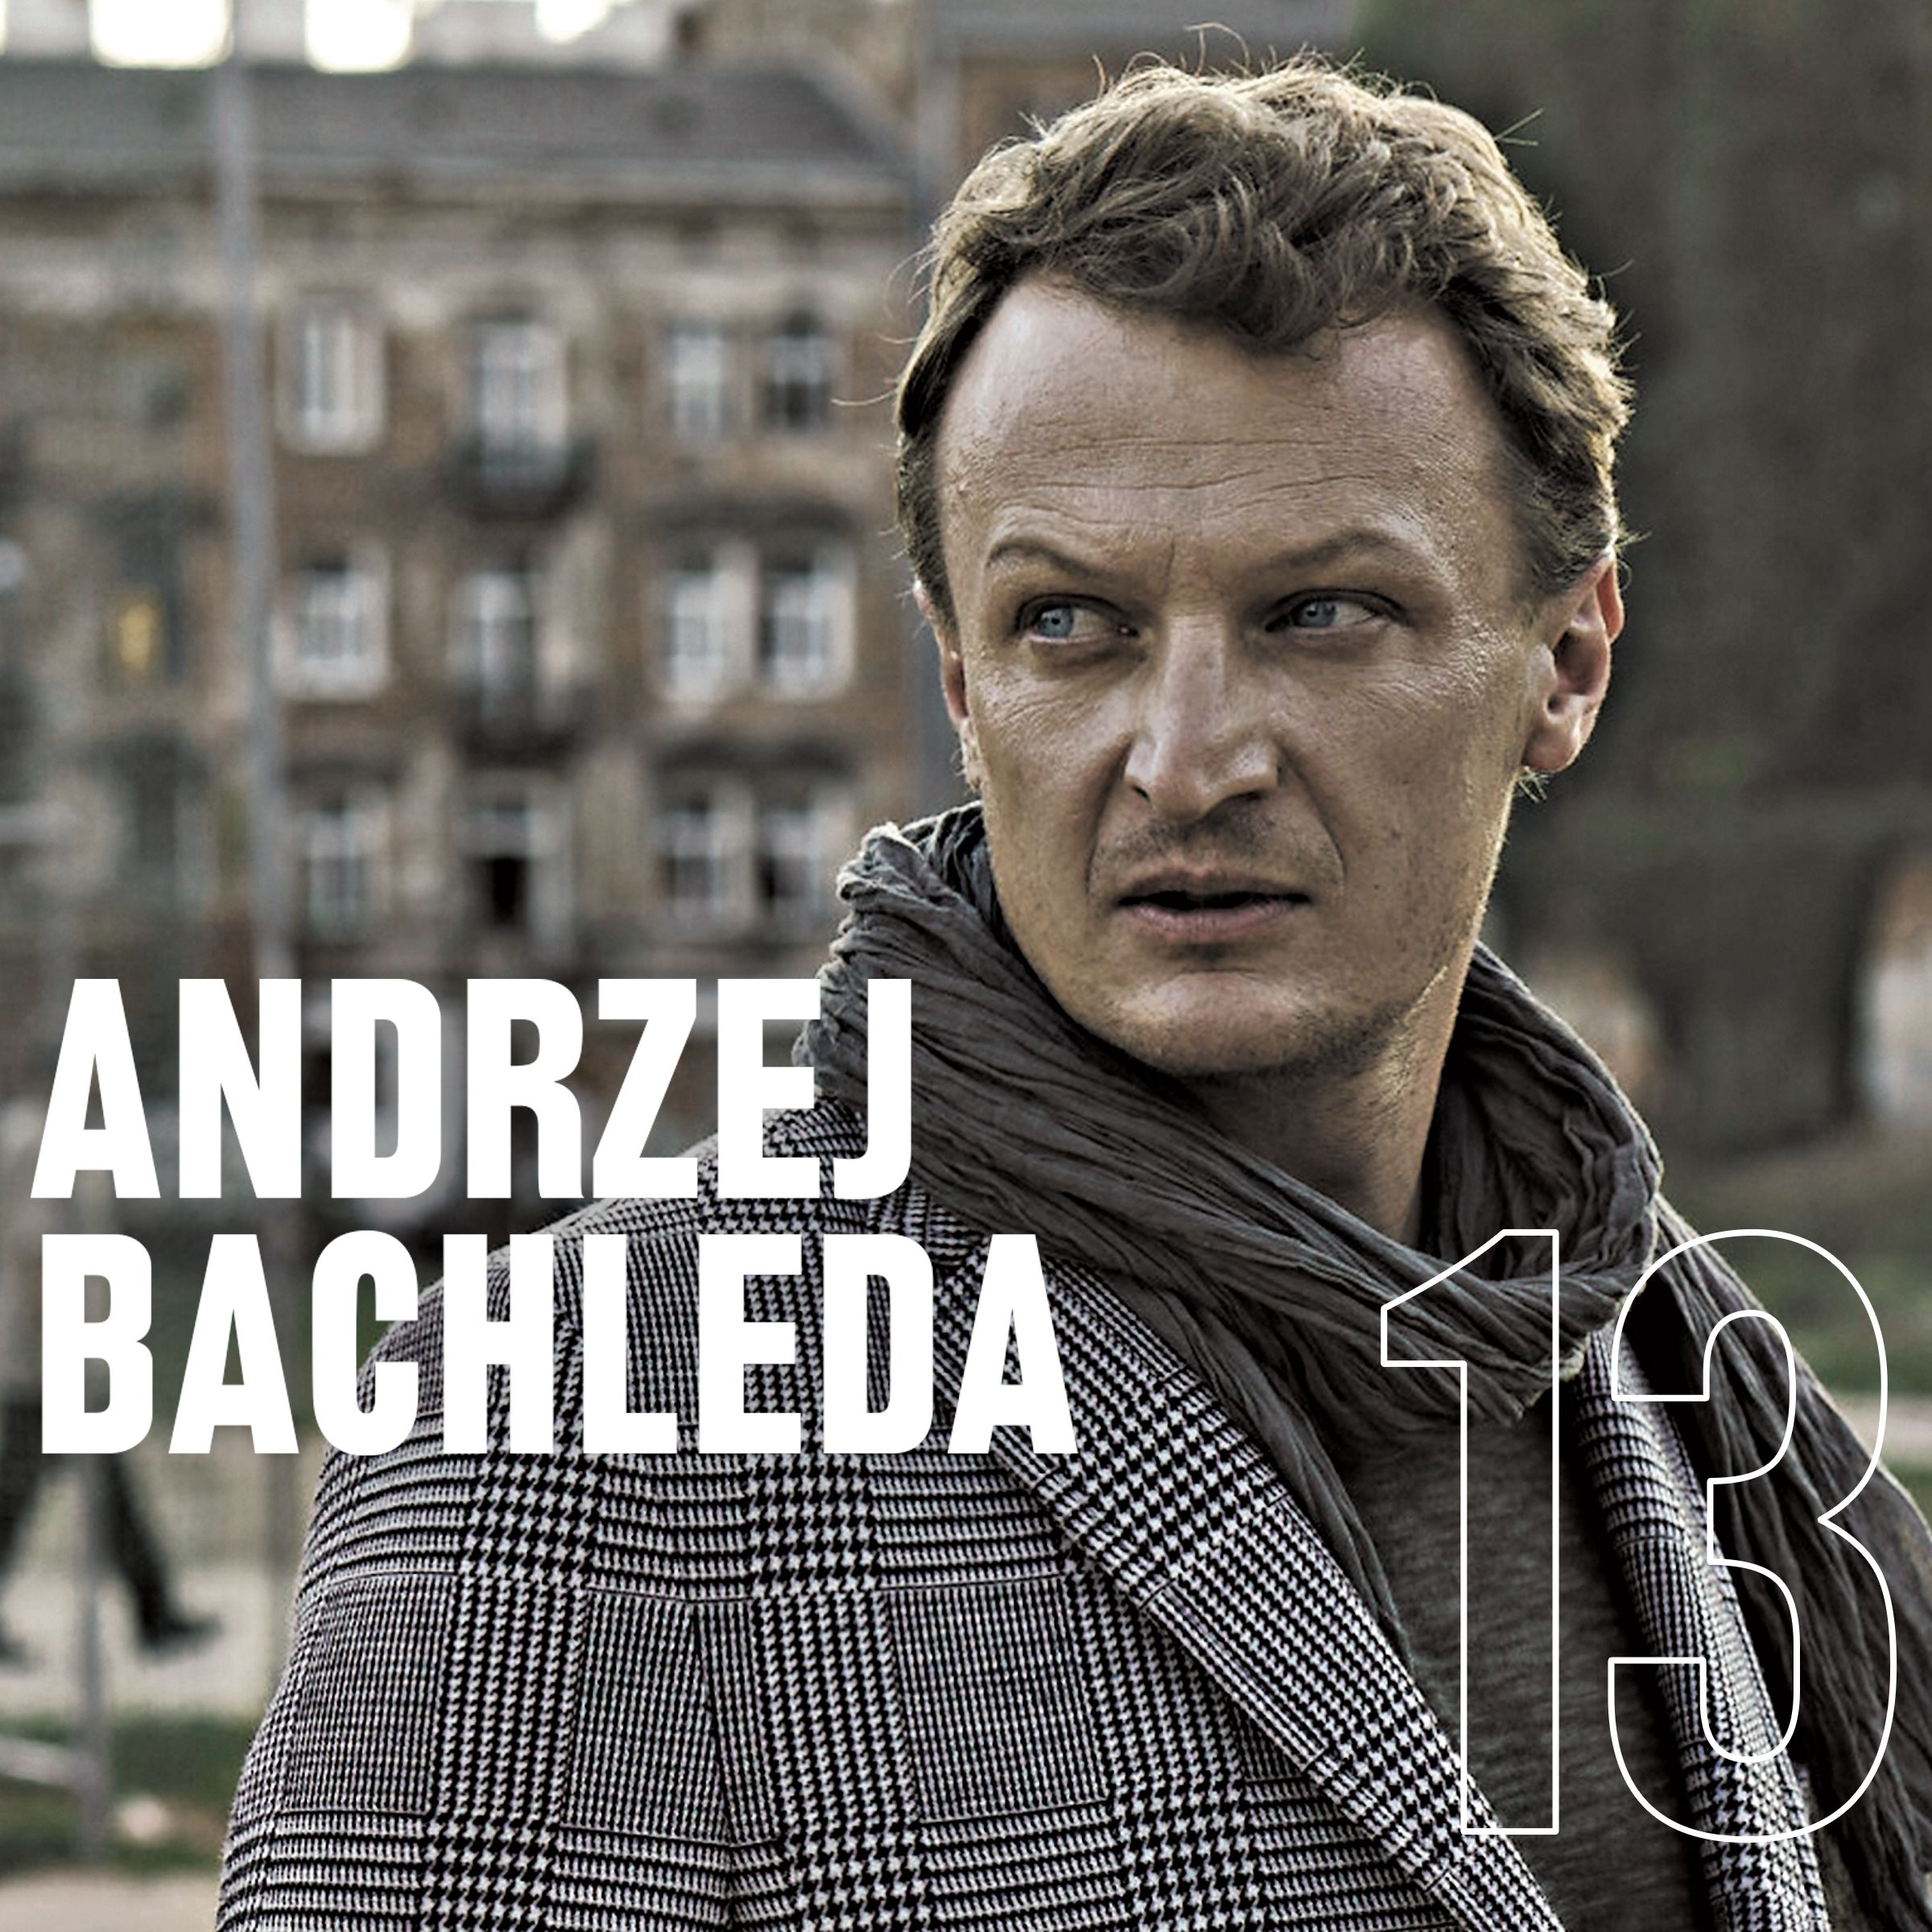 Andrzej Bachleda 13 Płyta CD digipack